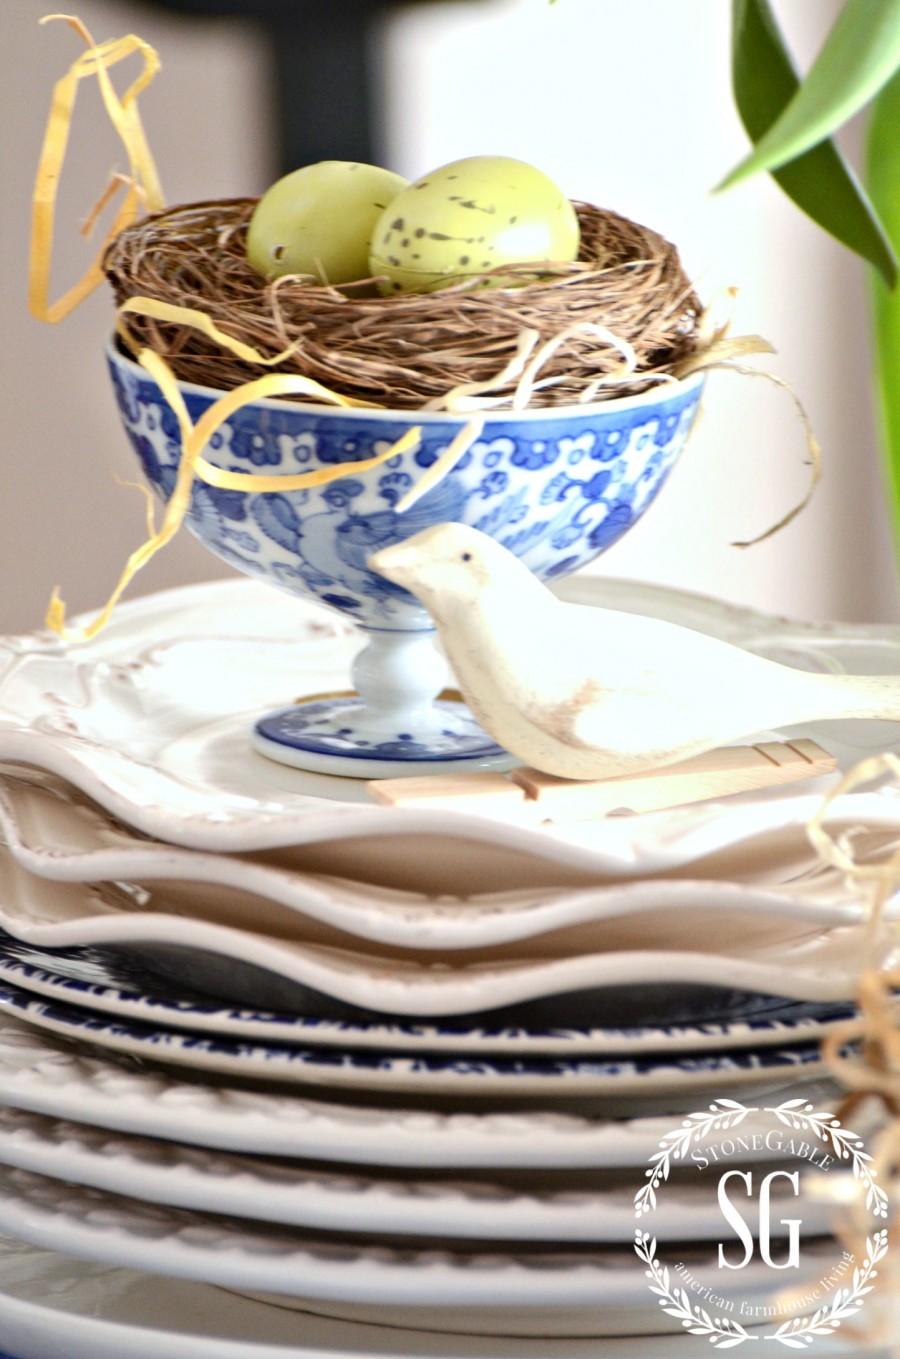 SPRING KITCHEN TABLE VIGNETTE-blue and white dish with nest-stonegableblog.com